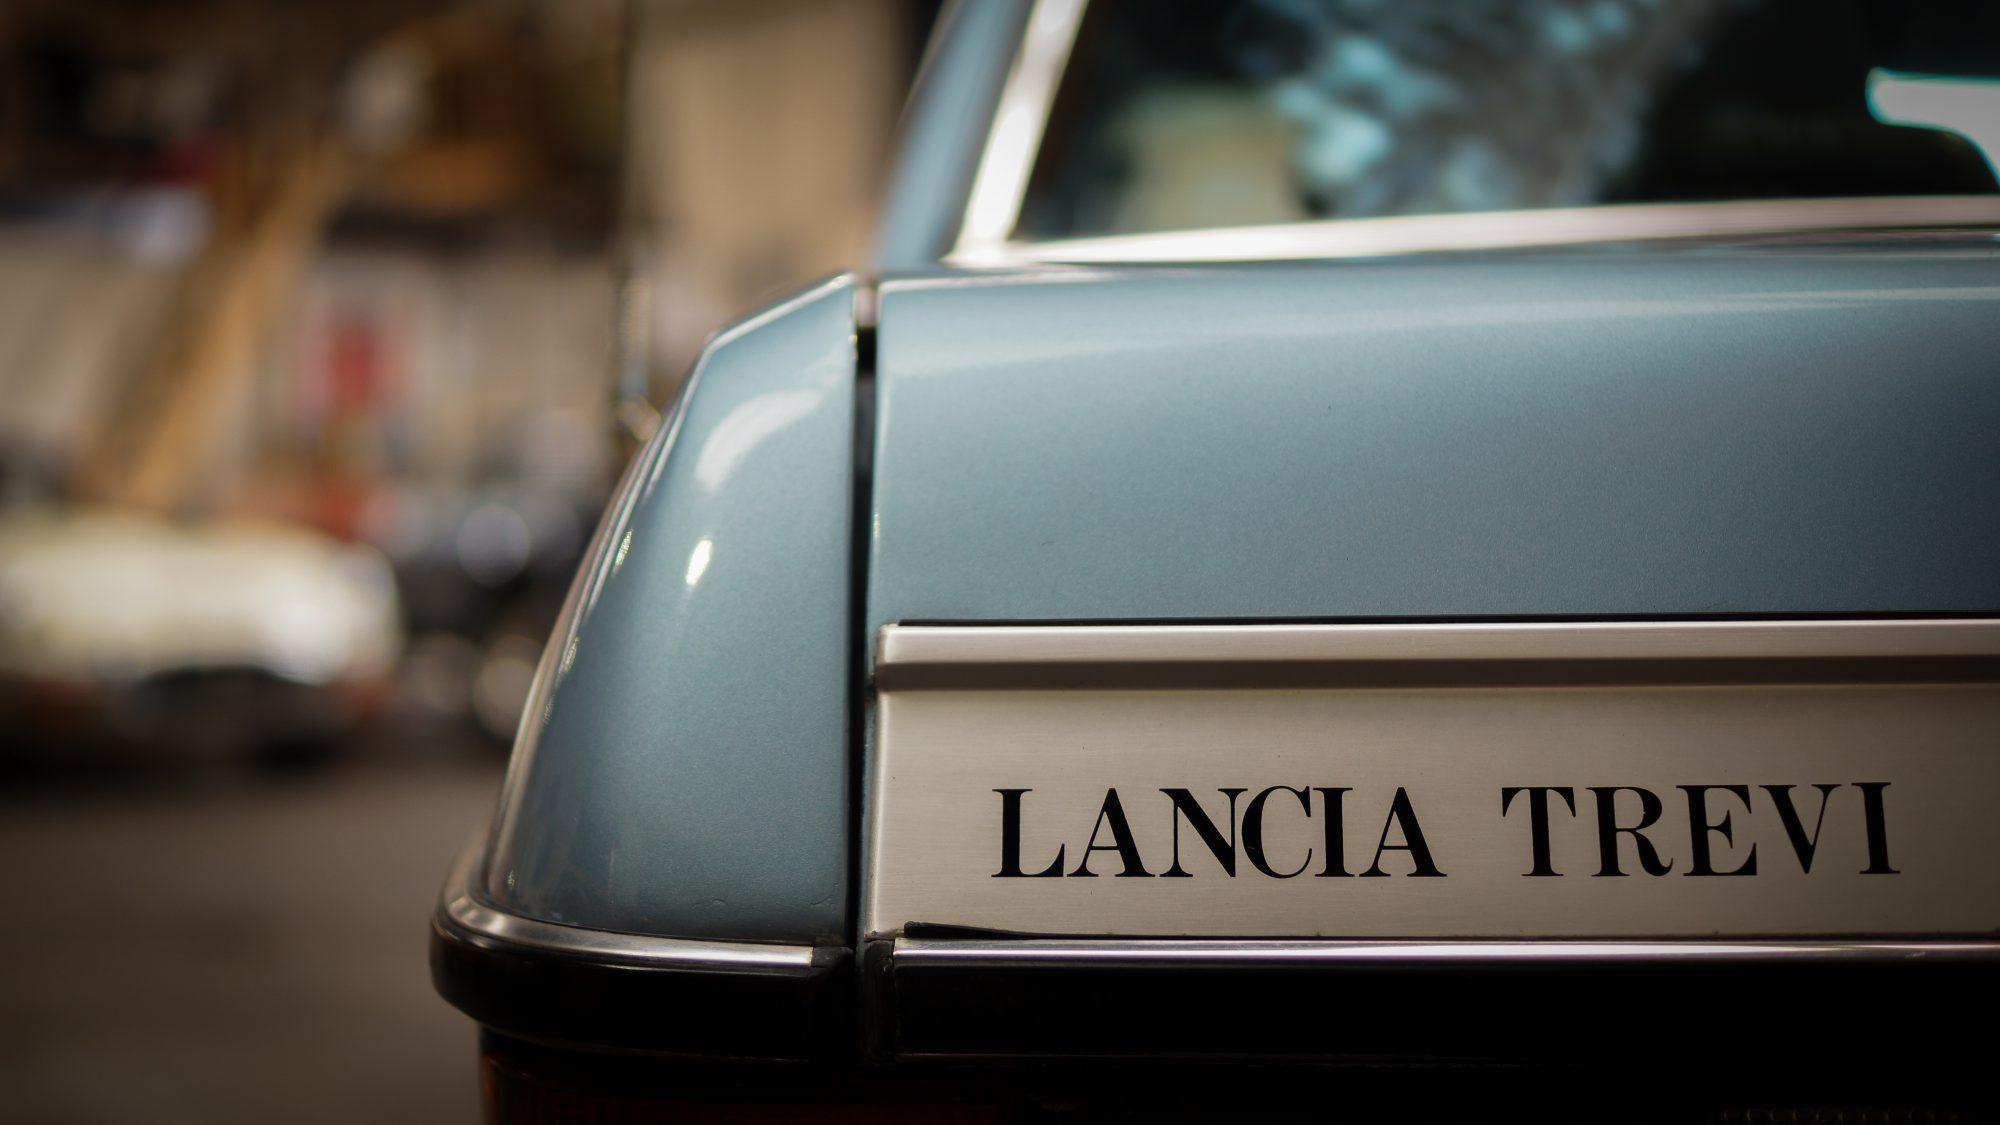 Lancia, Lancia Trevi, Trevi, Trevi 2000, Lancia Beta, Beta